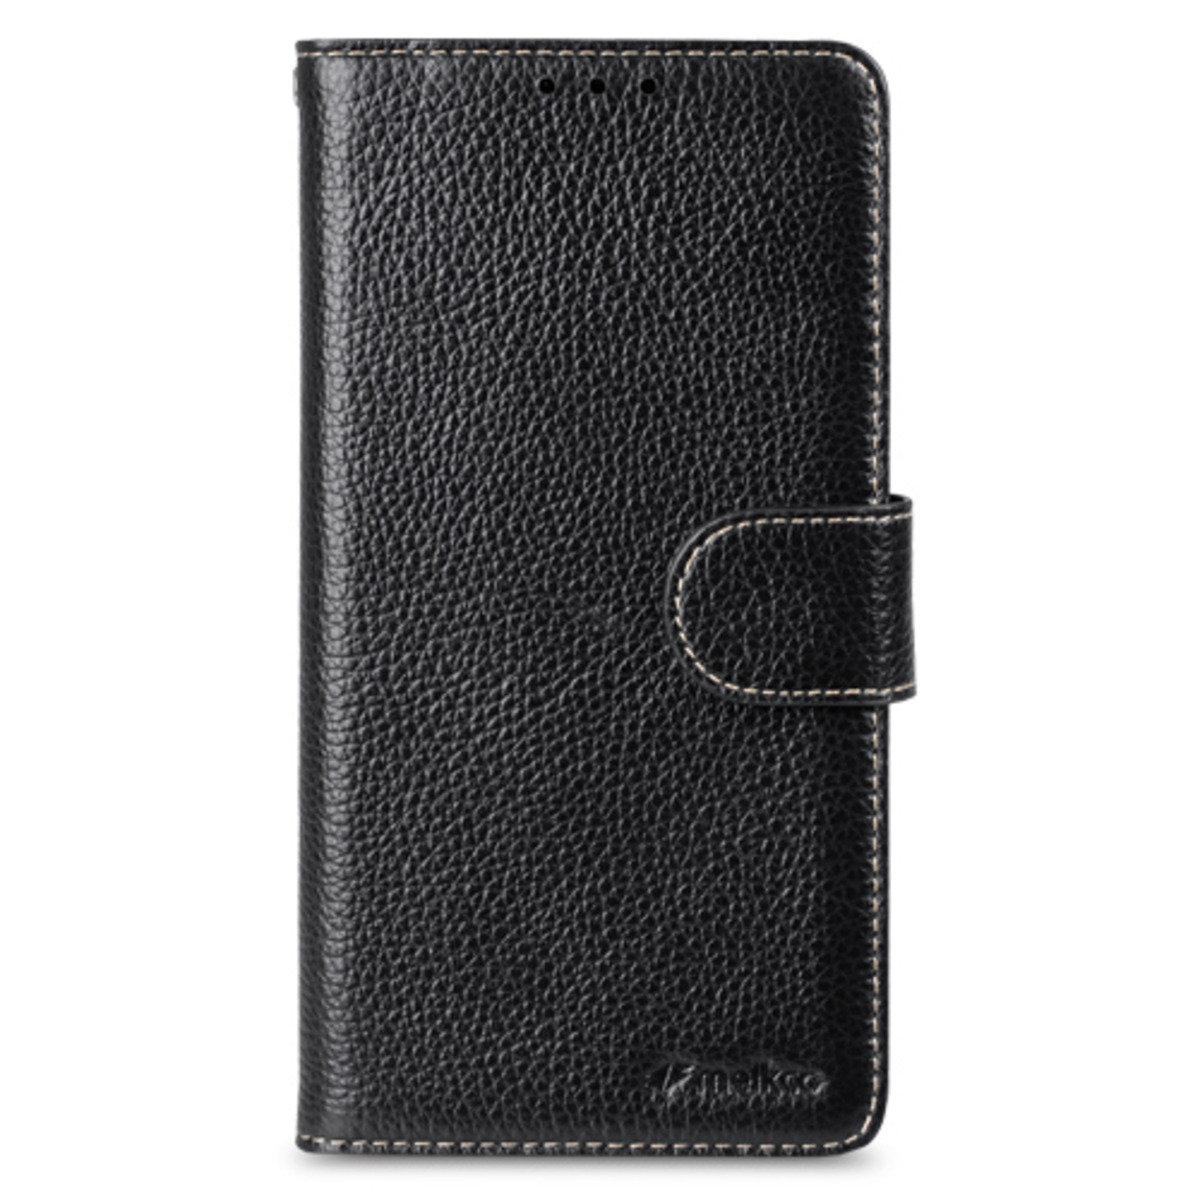 Samsung Galaxy Note 5 Wallet Book Type 高級真皮革手機套 - 黑色荔枝紋